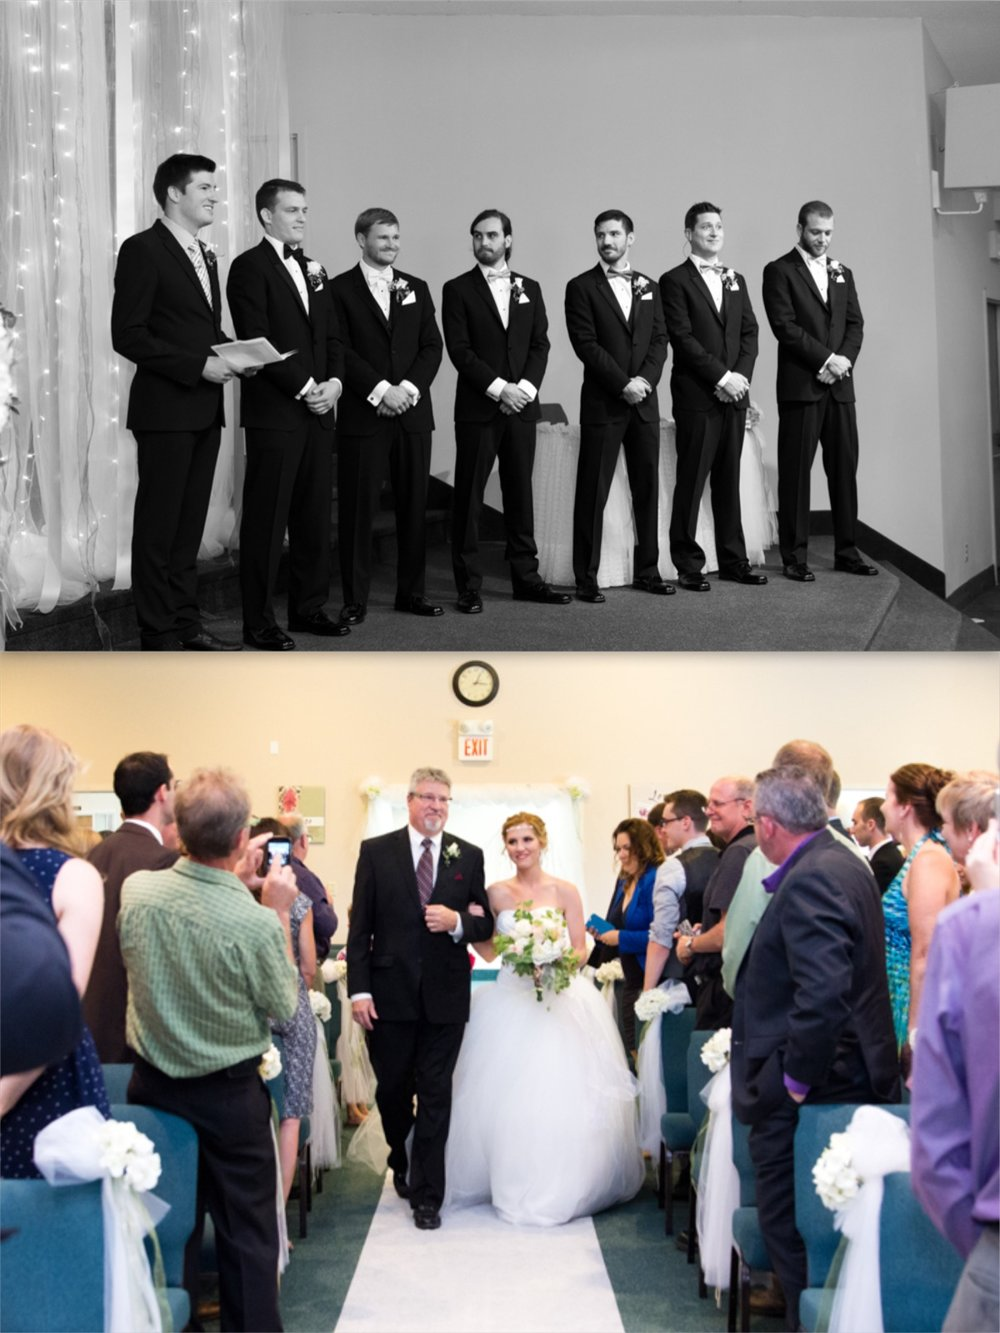 FIRST LOOK OF THE BRIDE REVEAL WEDDING PHOTOS | TORONTO WEDDING PHOTOGRAPHER